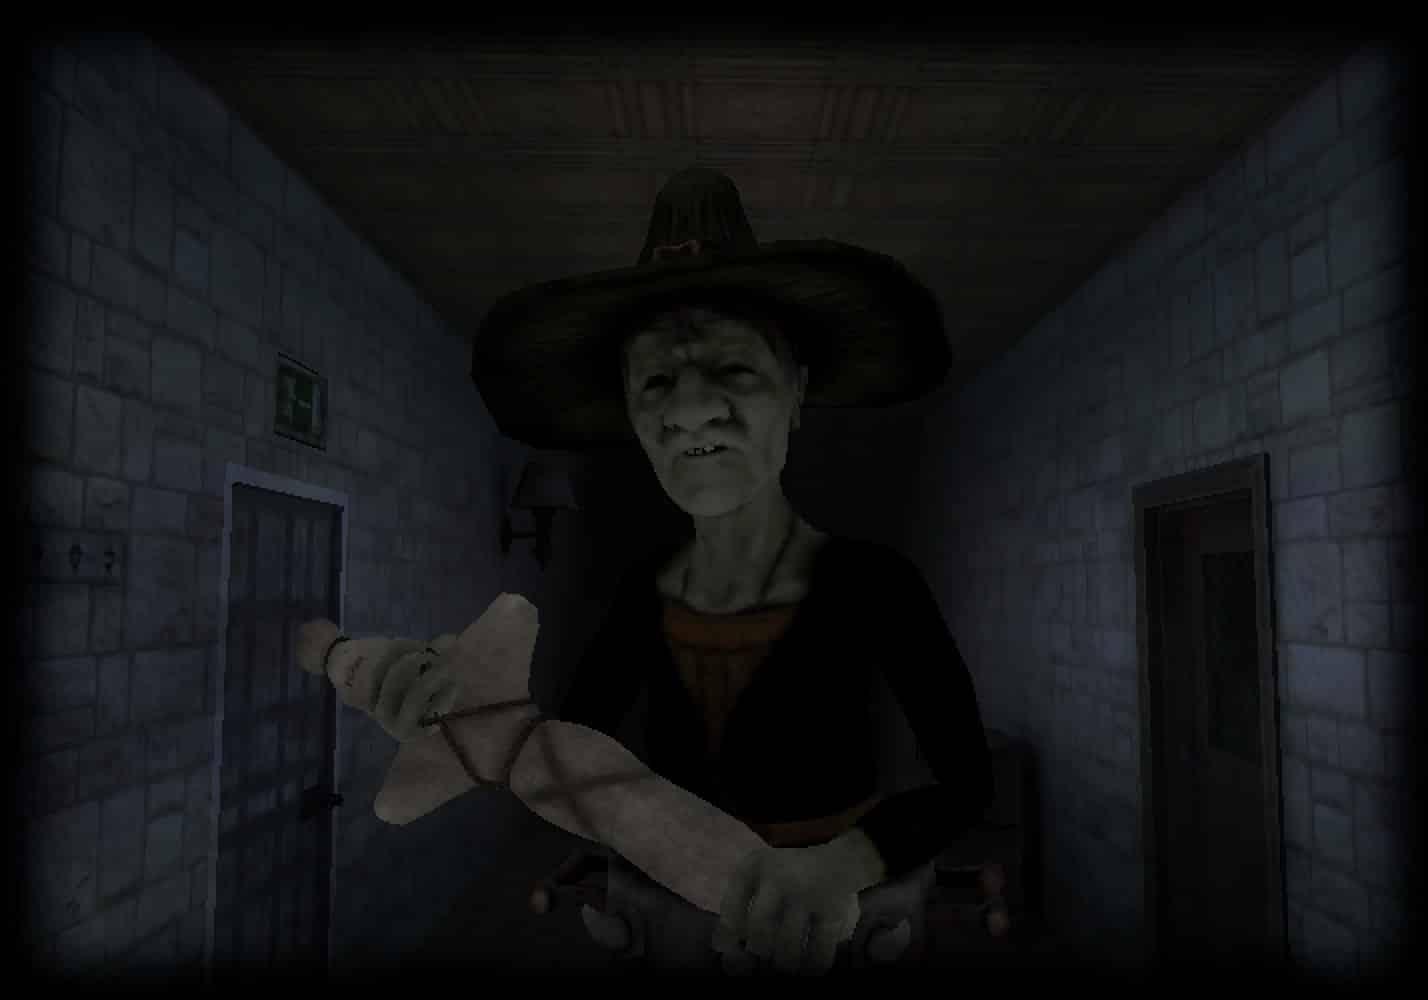 Eyes Scary Thriller - Creepy Horror Game